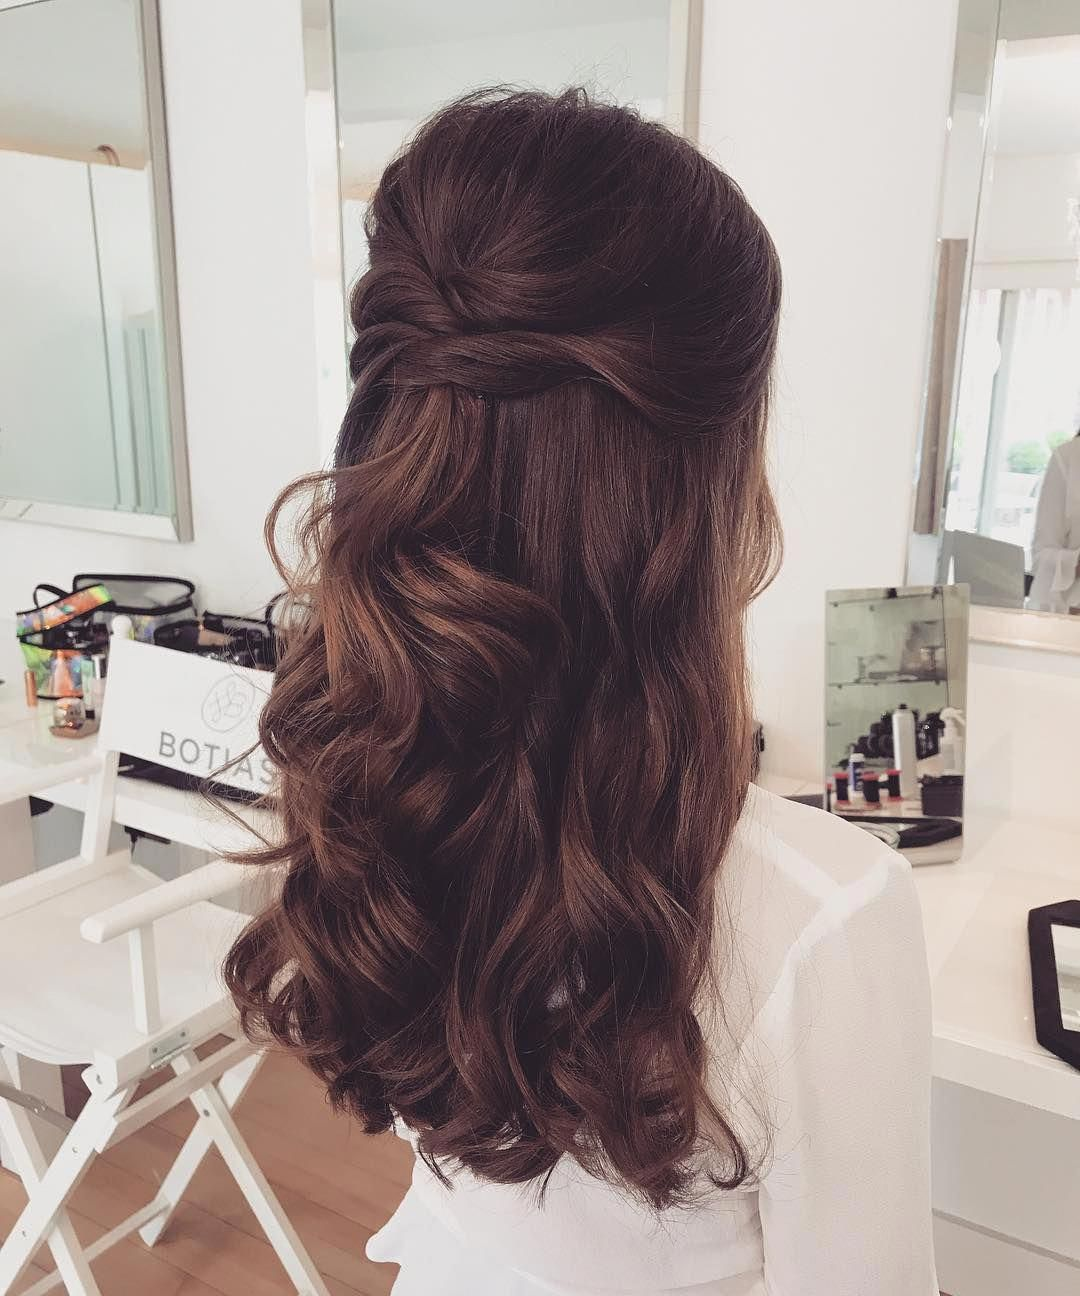 Wedding Hairstyle Half Up Half Down: Beautiful Half Up Half Down Wedding Hairstyles 1813